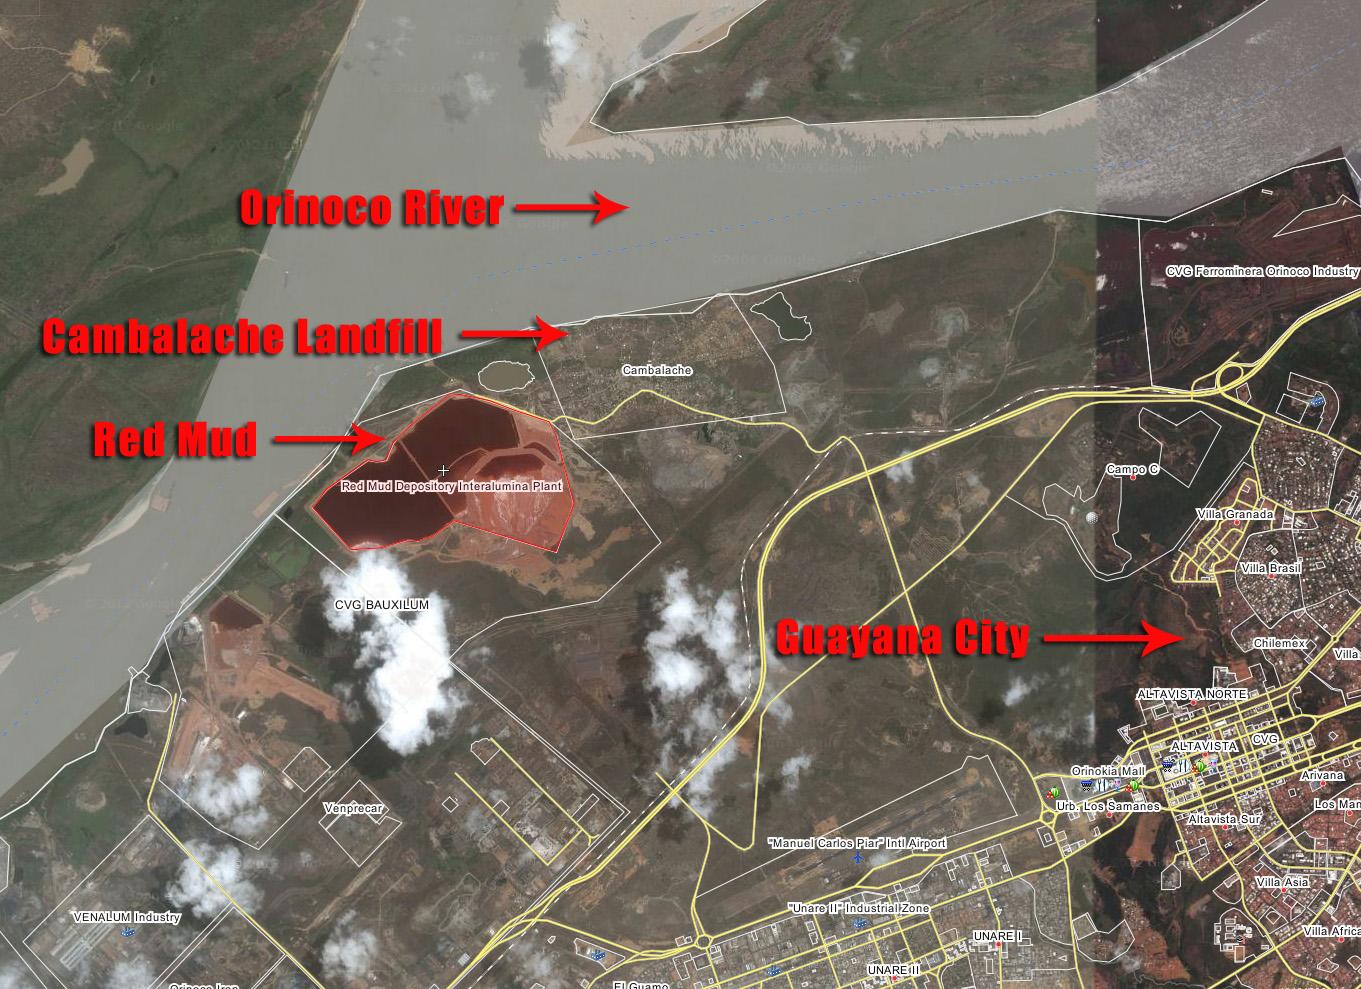 Map of Cambalache Landfill.jpg